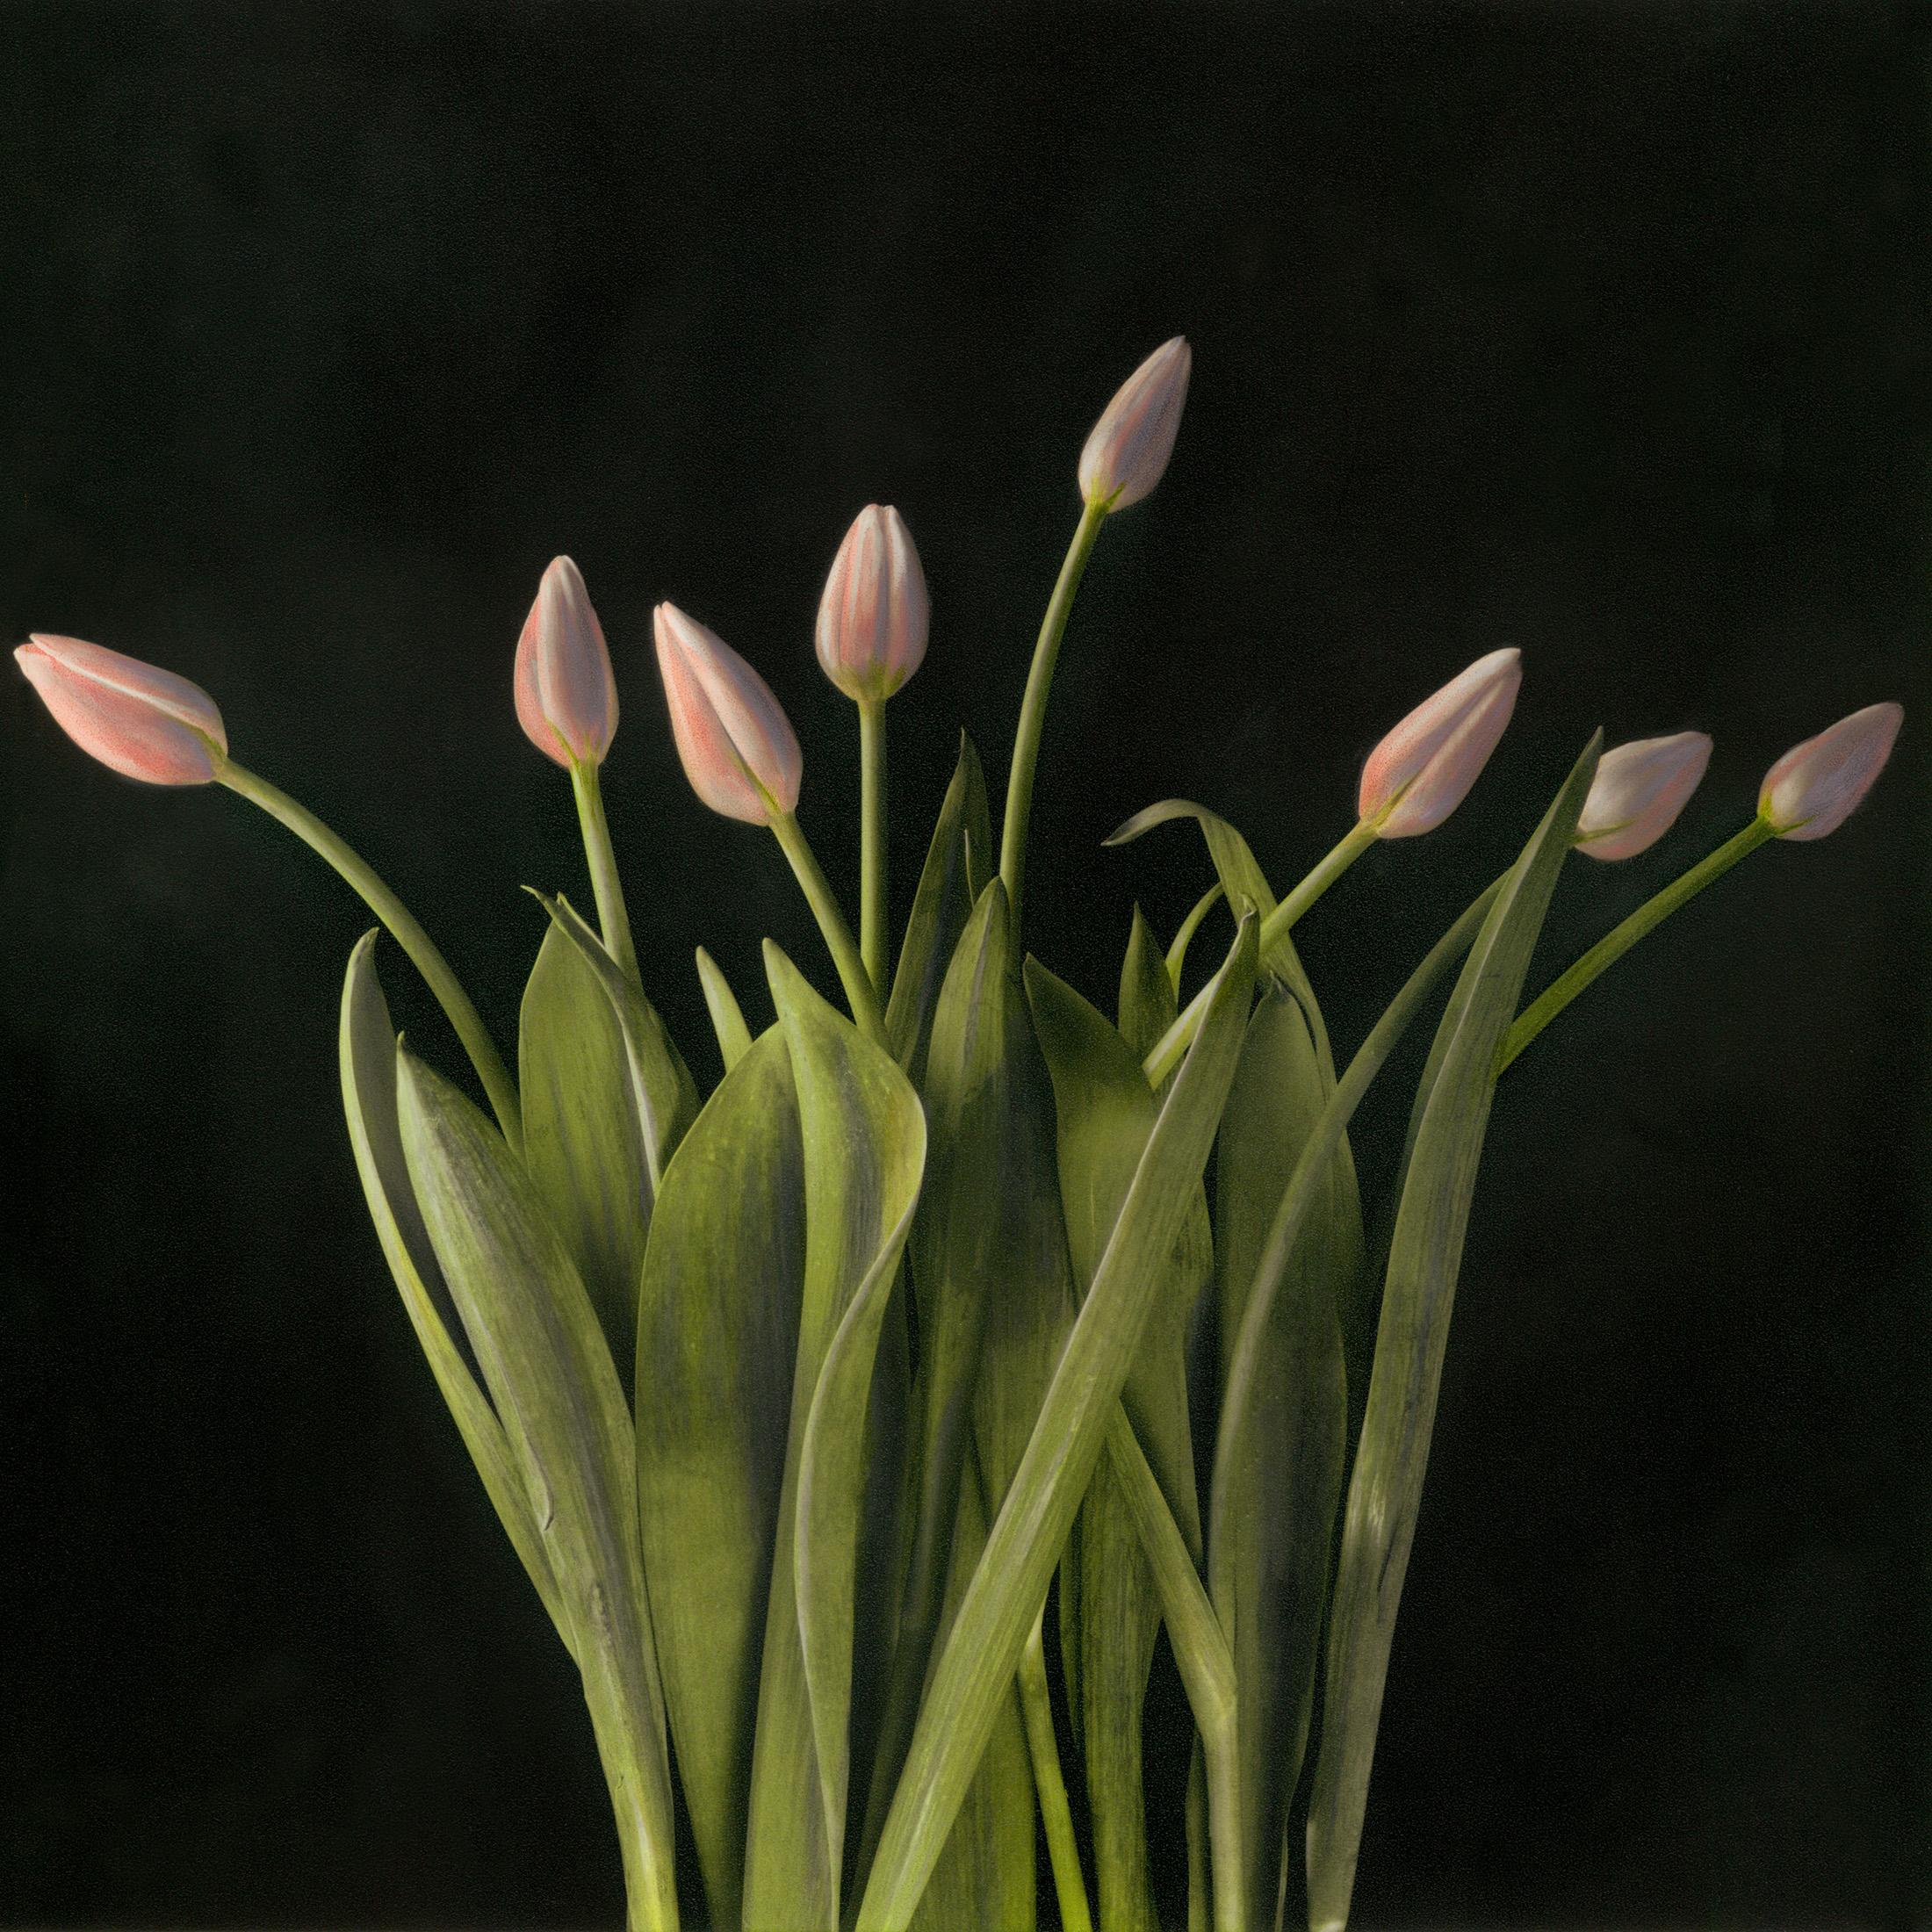 Tulip Buds